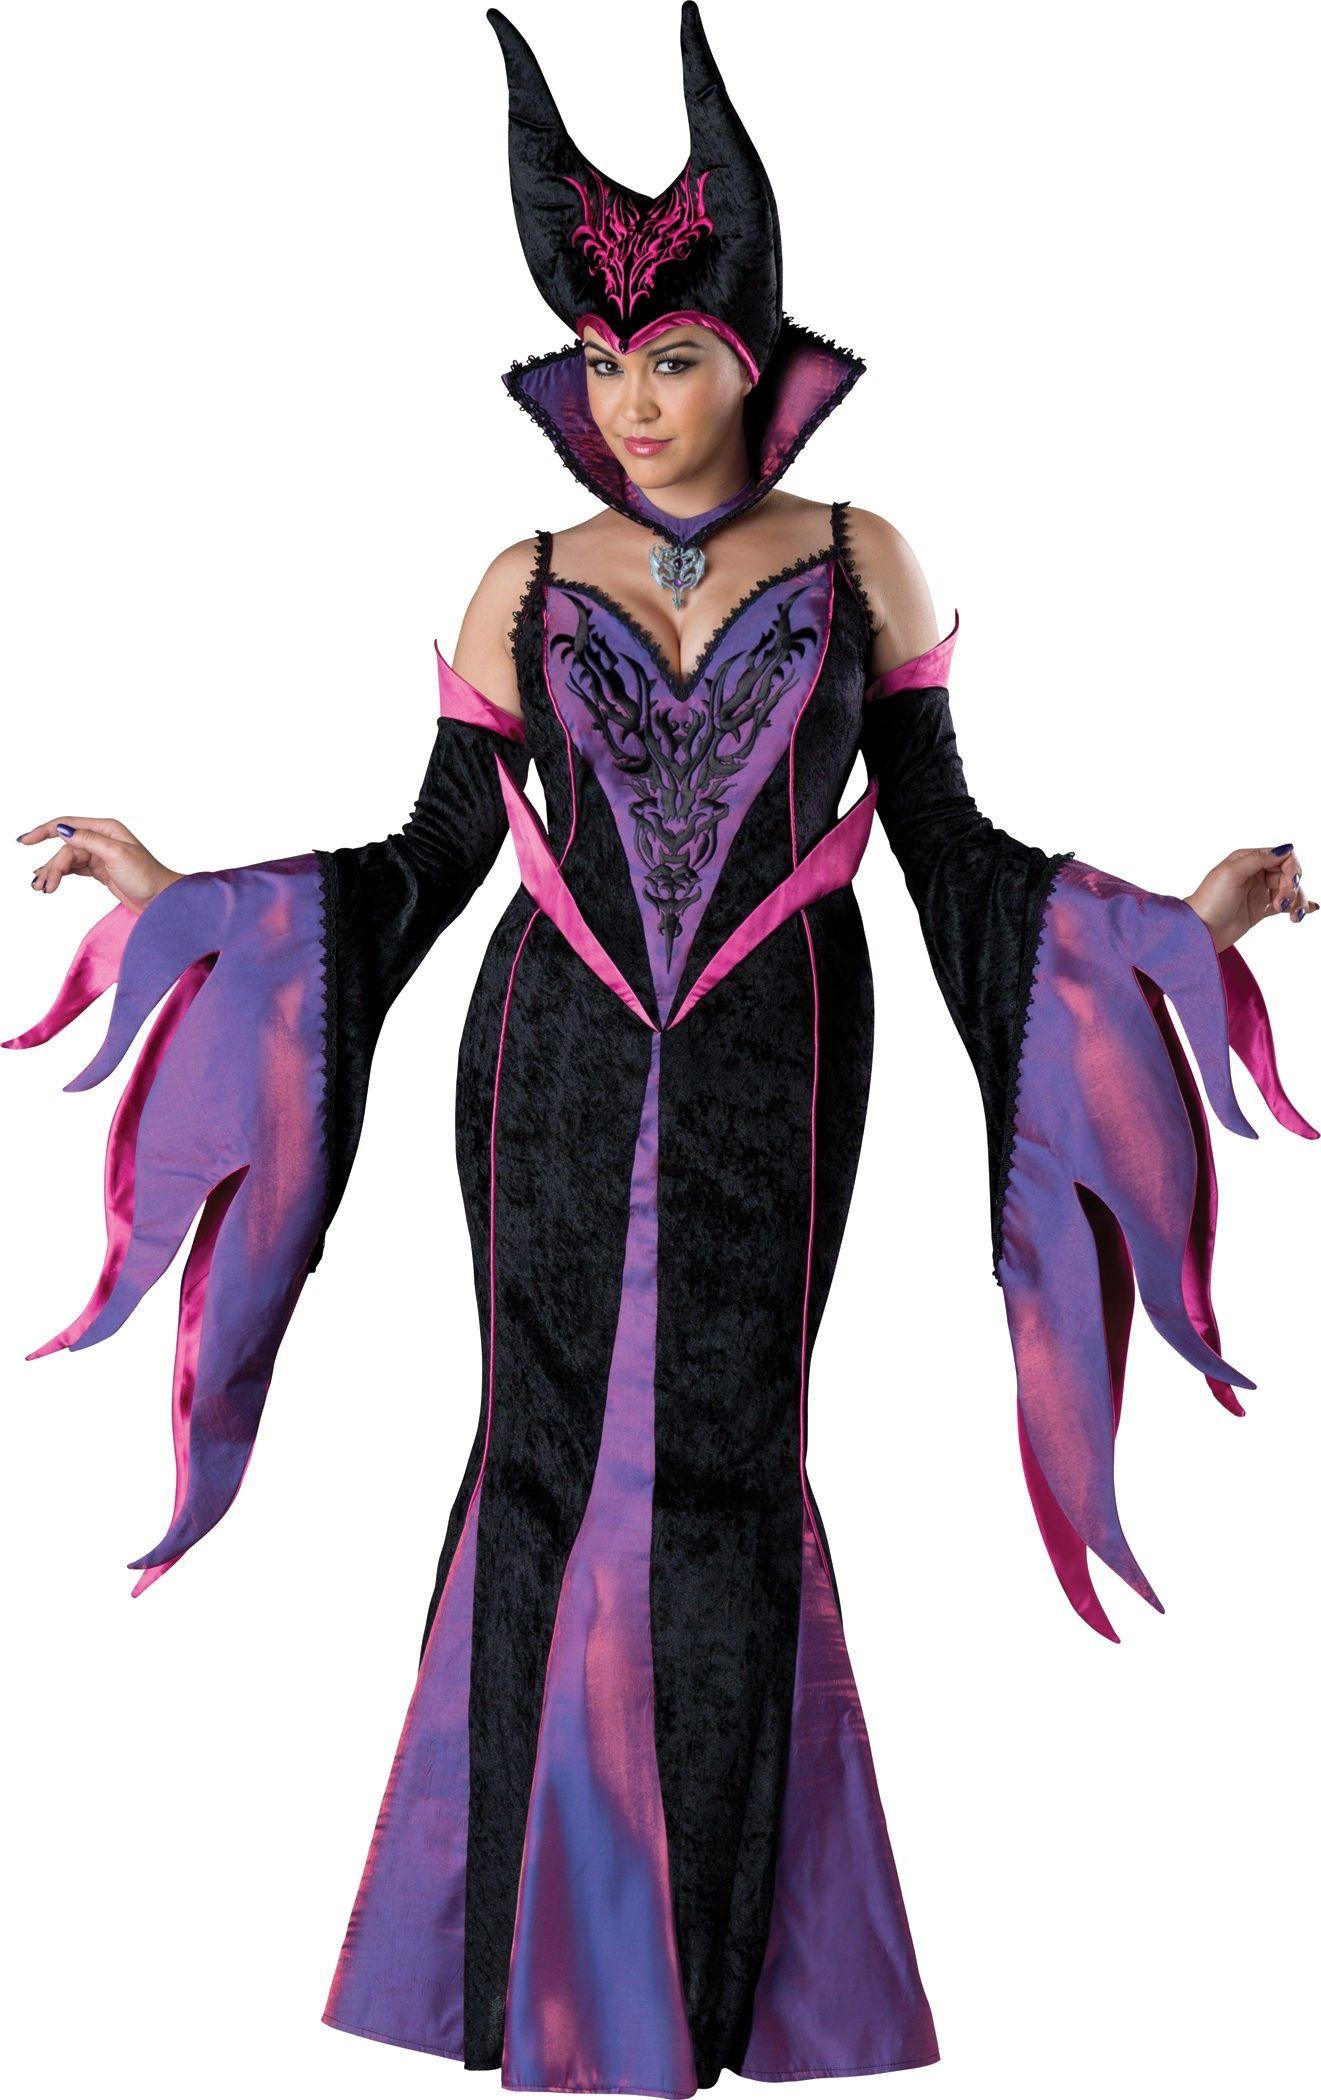 Best Halloween Fancy Dress Costumes Collection | Top 2 ...